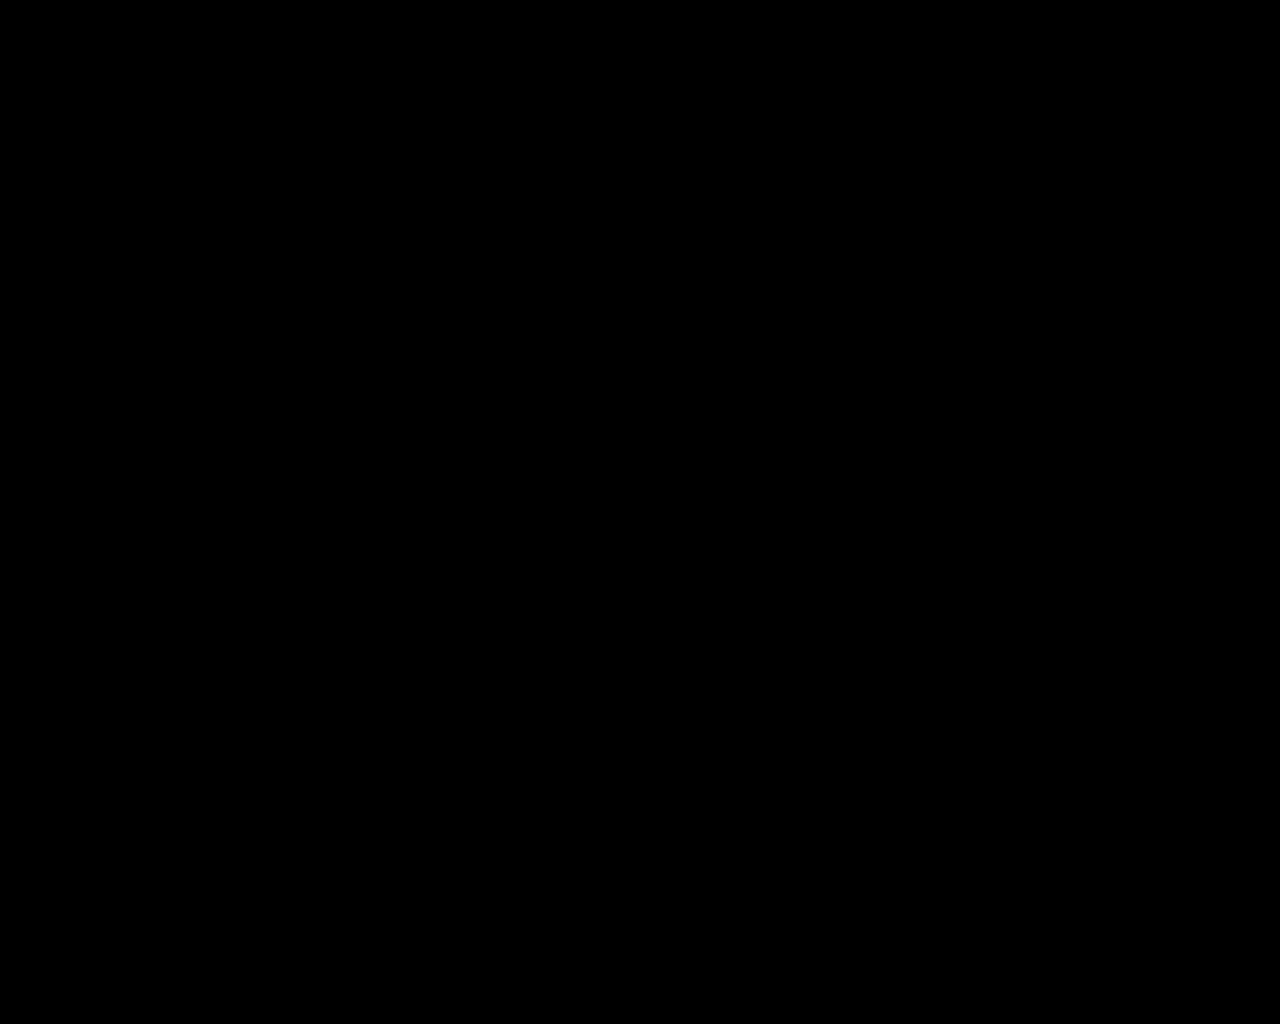 World Wallpaper: black wallpaper background